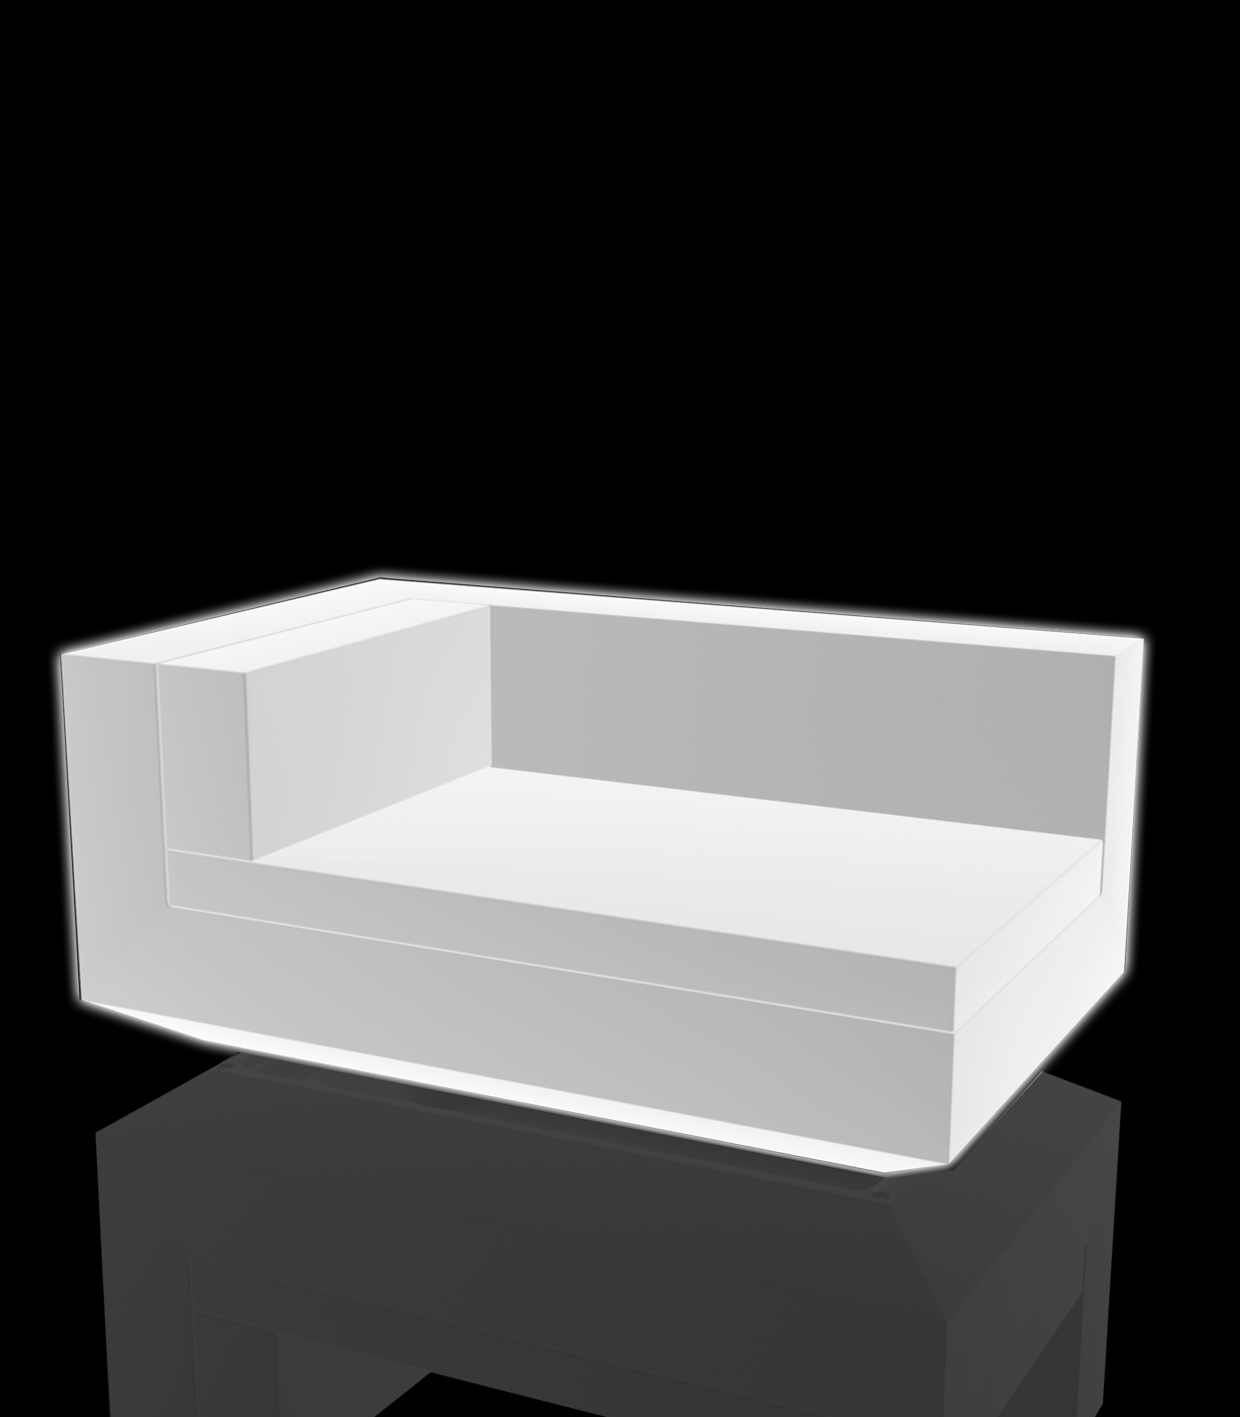 lighting chaise lounge adjustable vela sofa chaiselongue. Black Bedroom Furniture Sets. Home Design Ideas